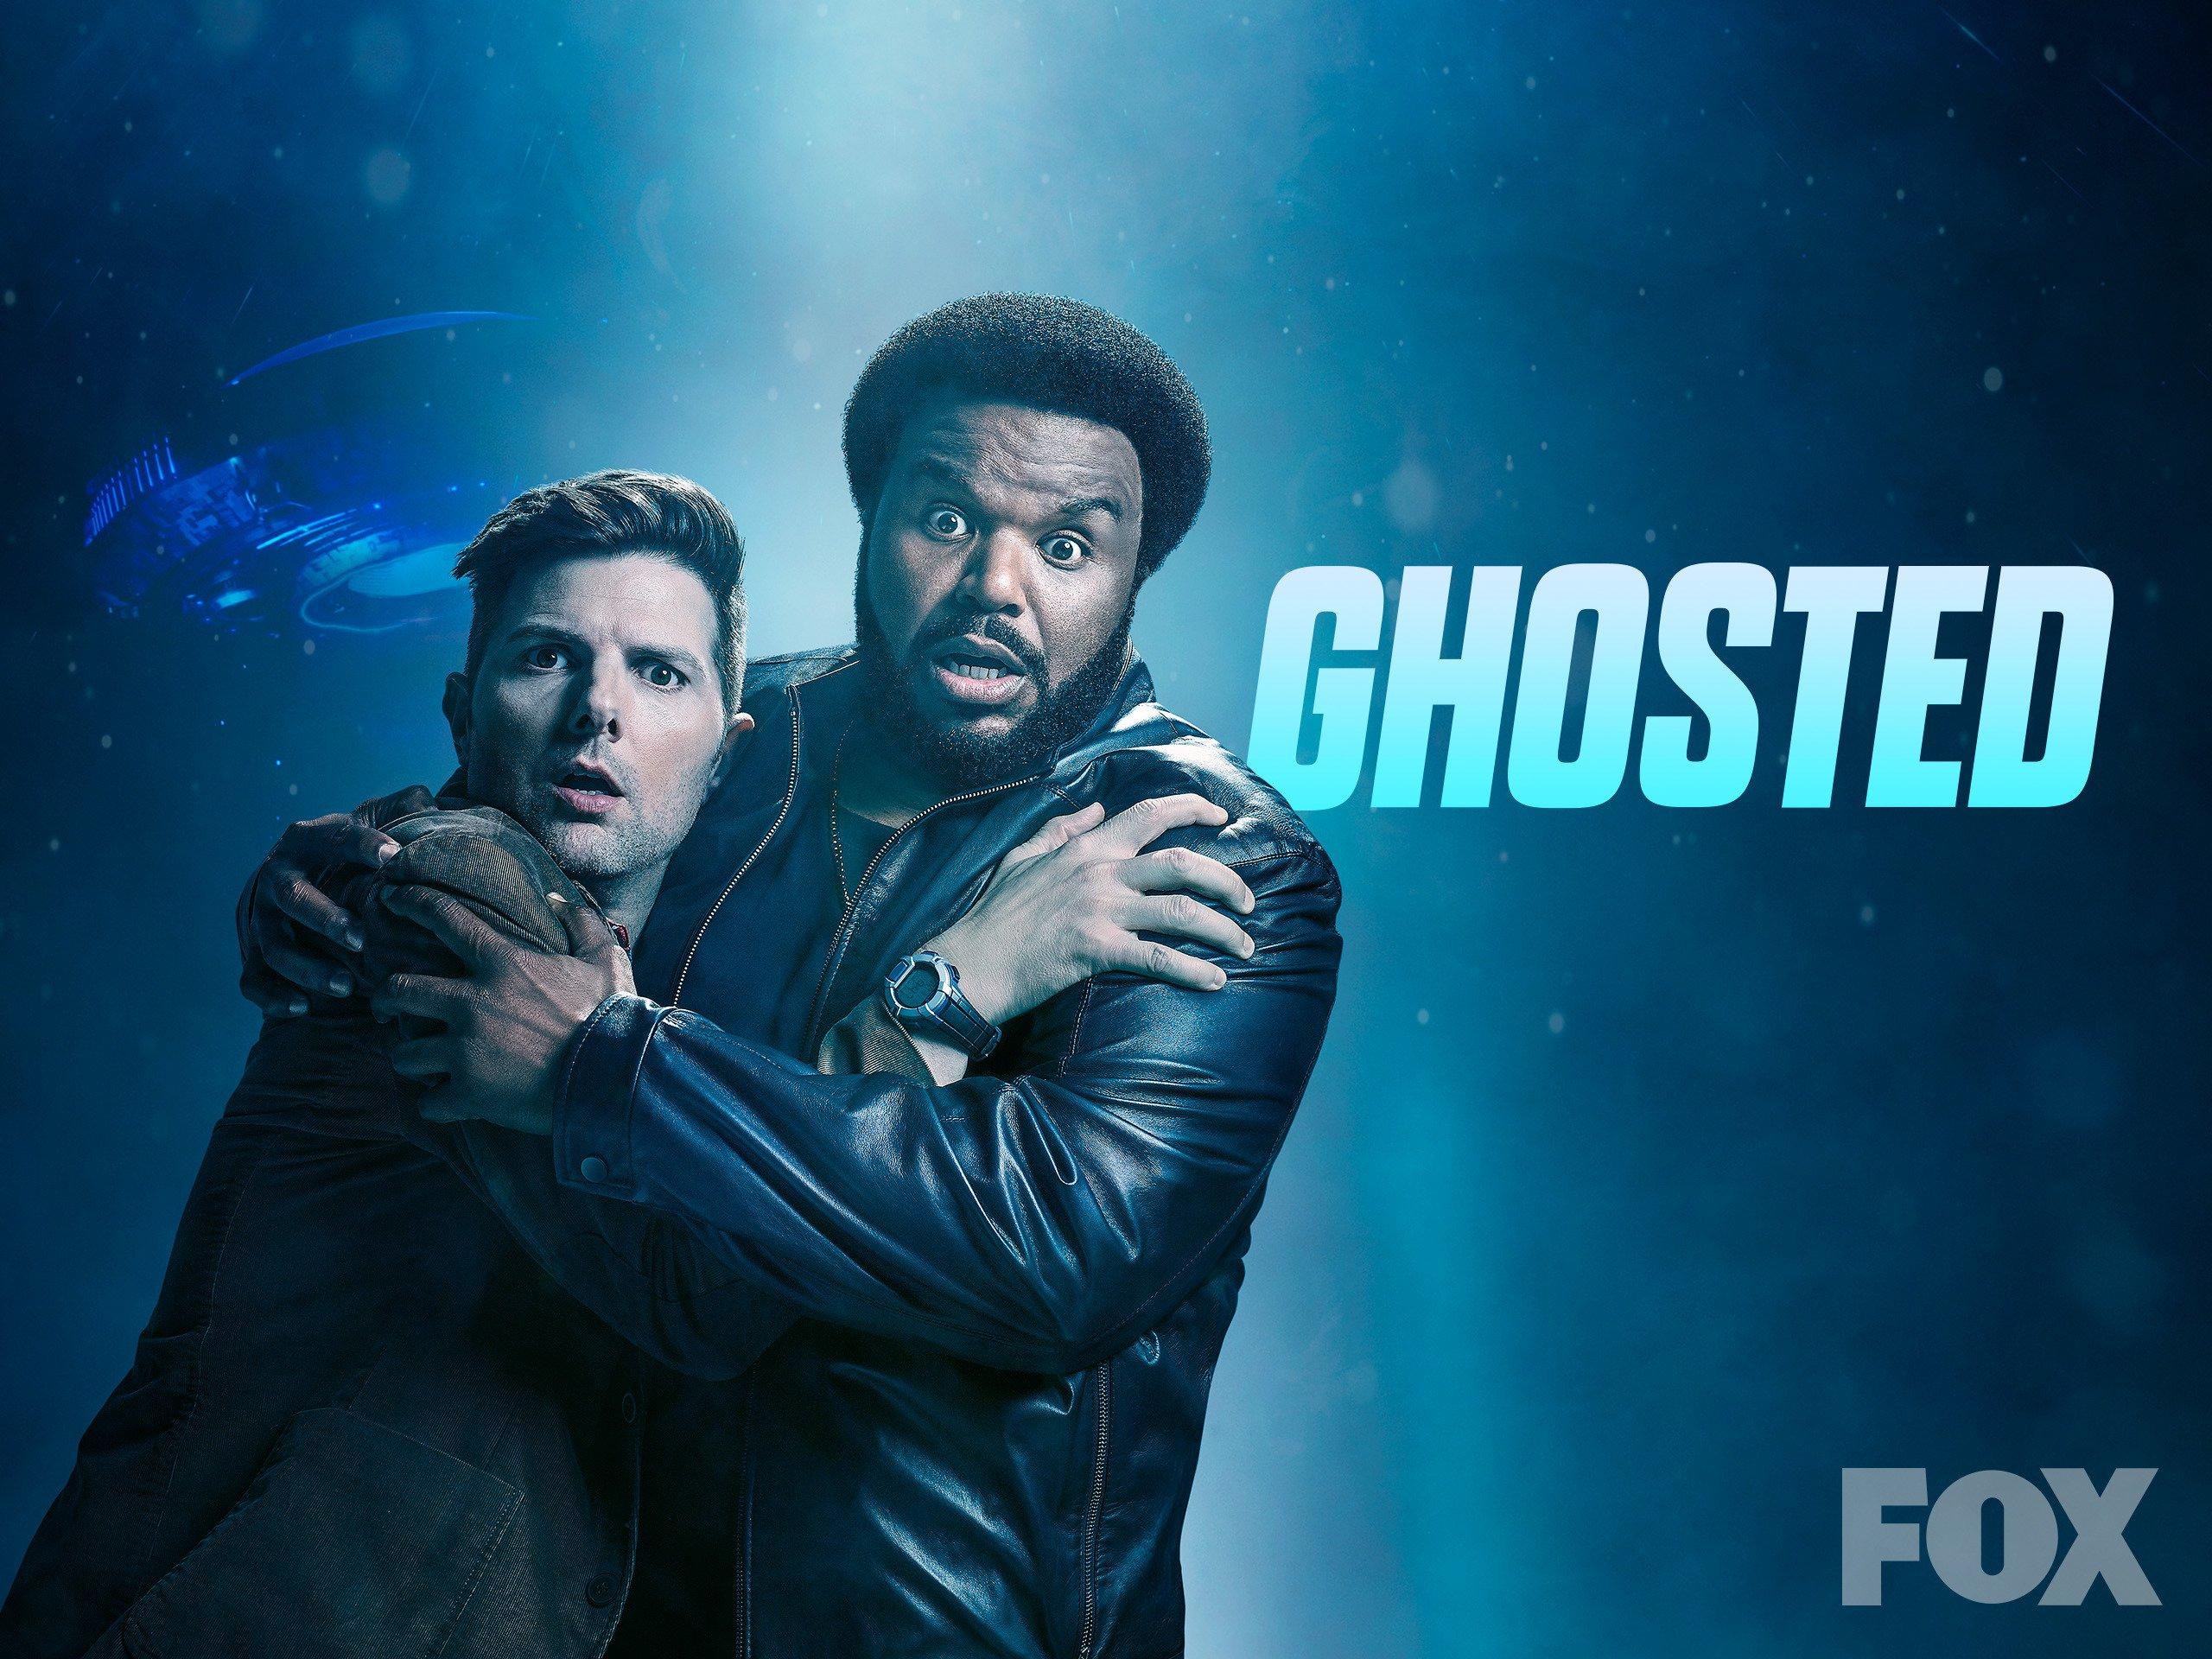 Amazon.com: Ghosted Season 1